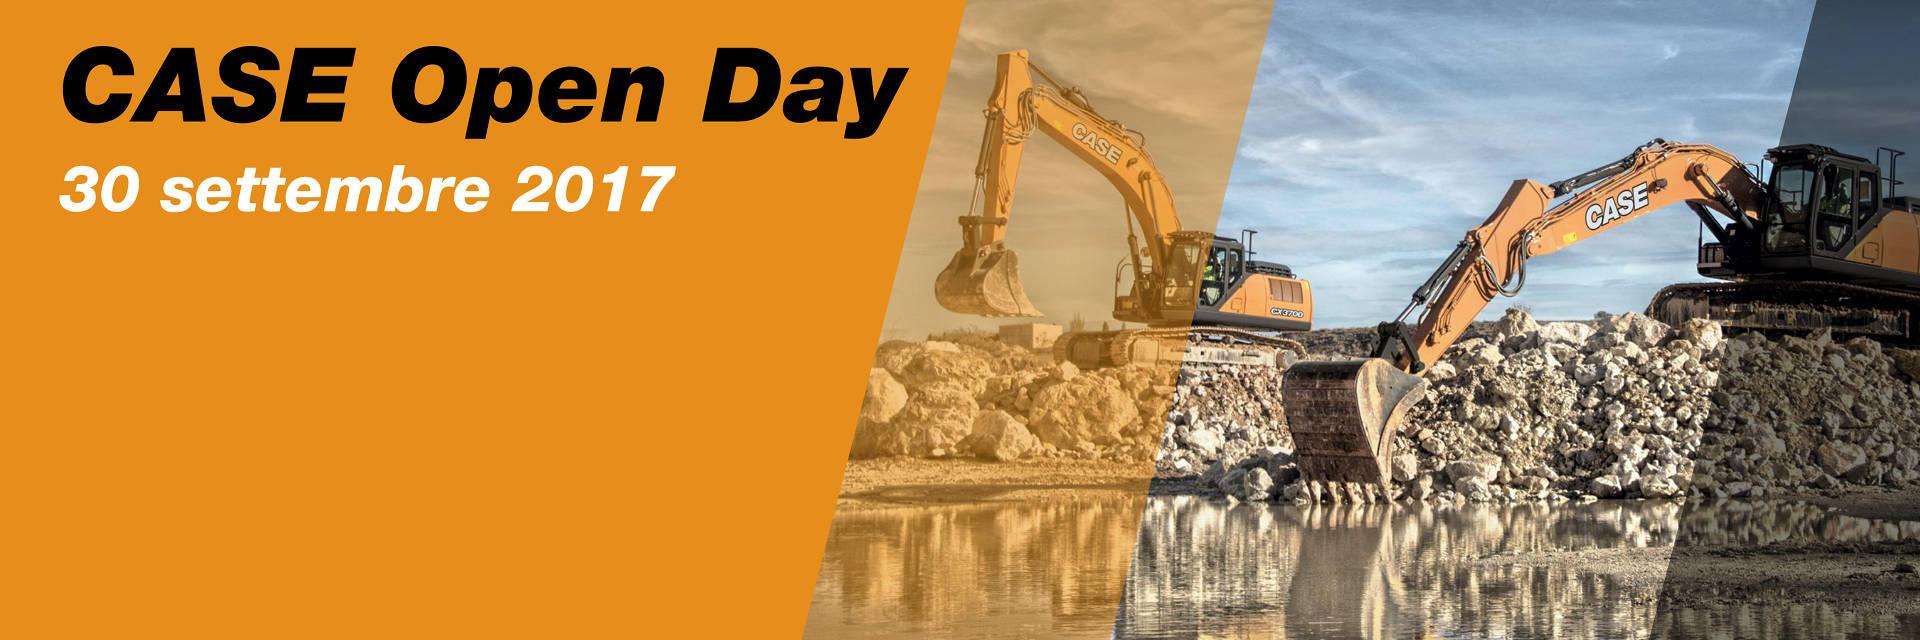 CASE Open Day 2017